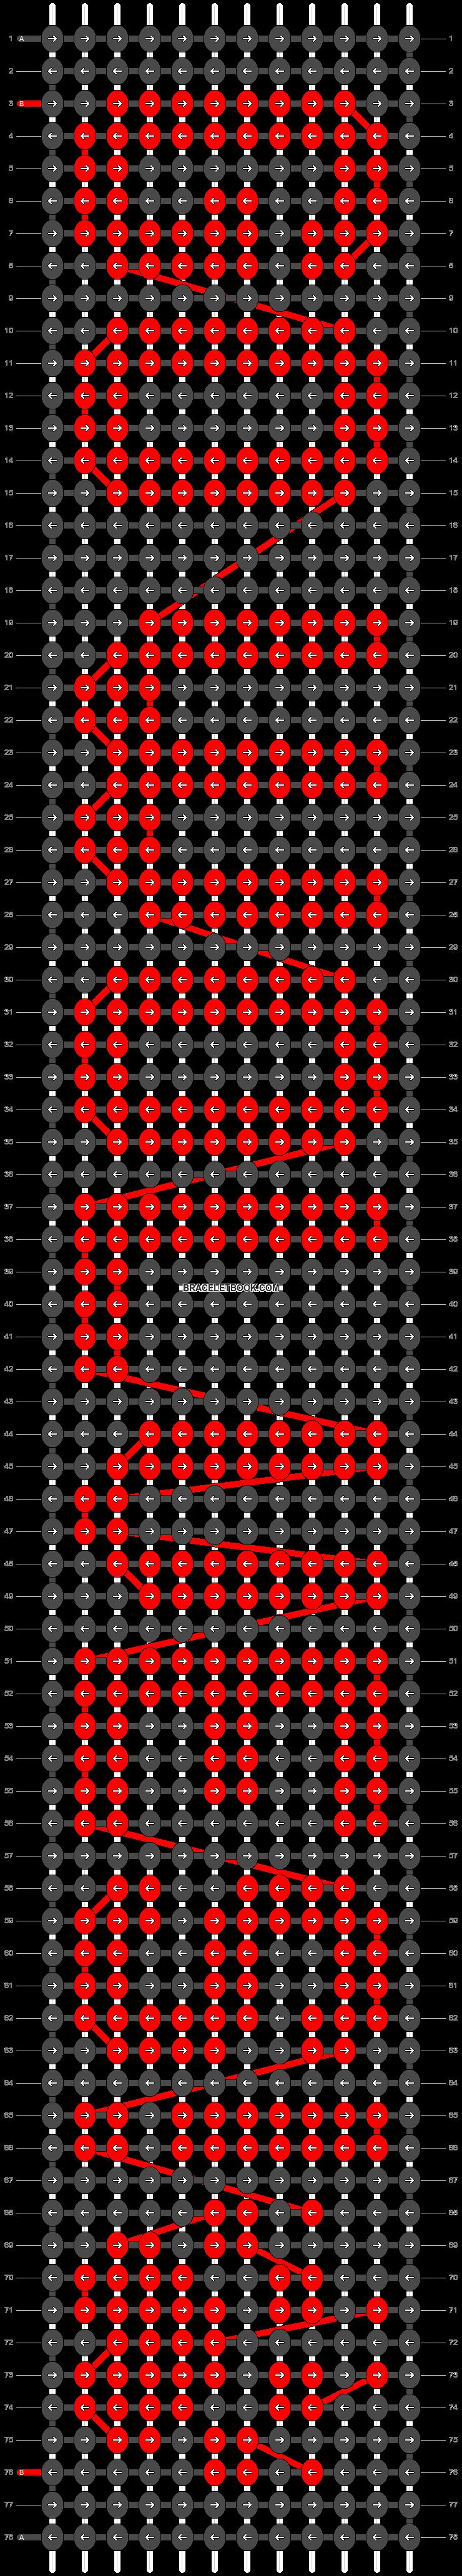 Alpha pattern #30198 pattern